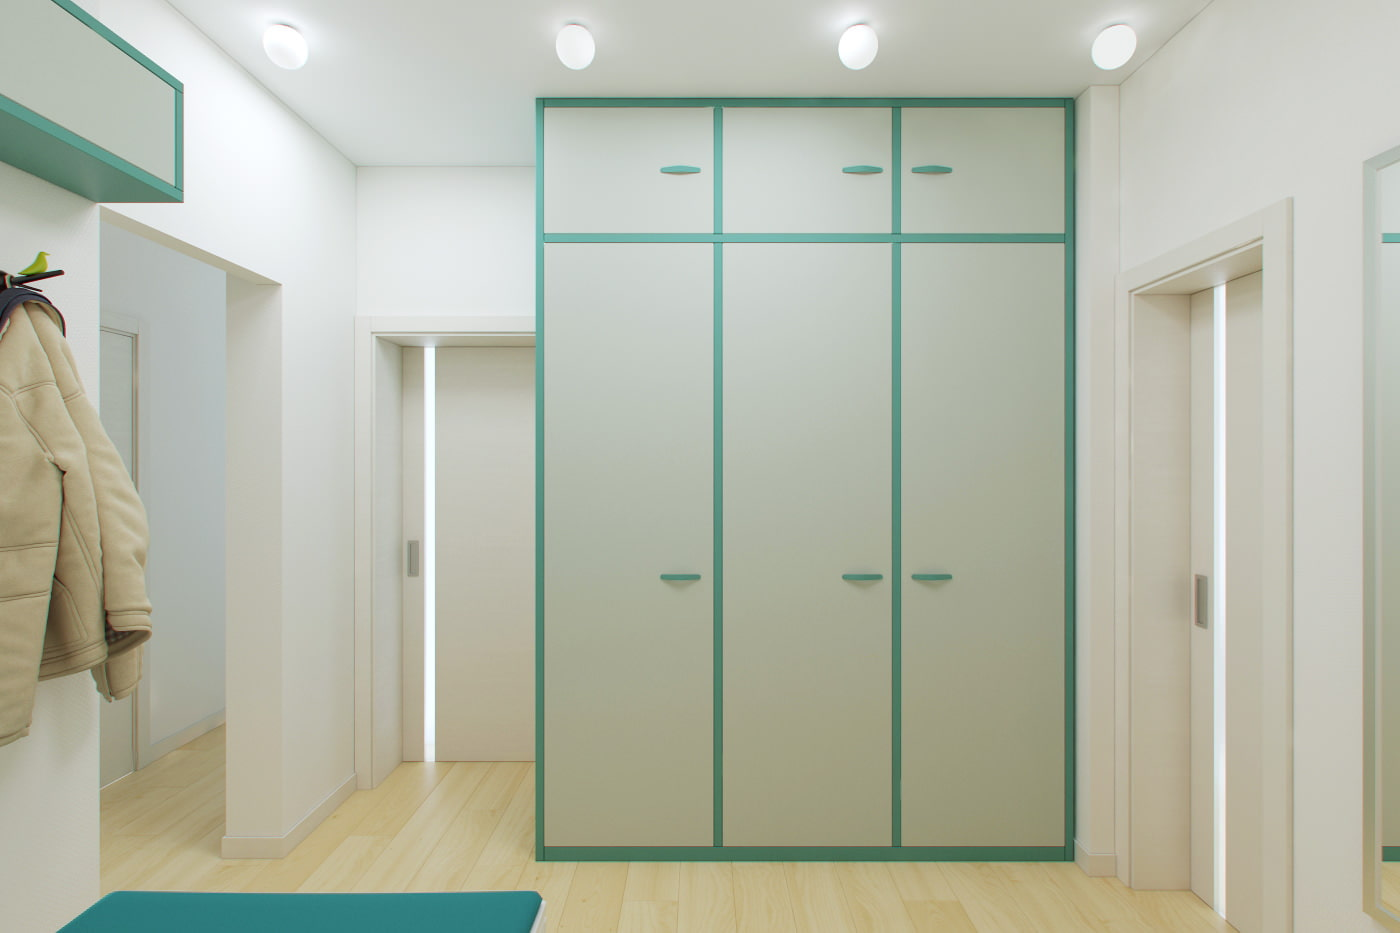 Дизайн двухкомнатной квартиры 55 кв. м..